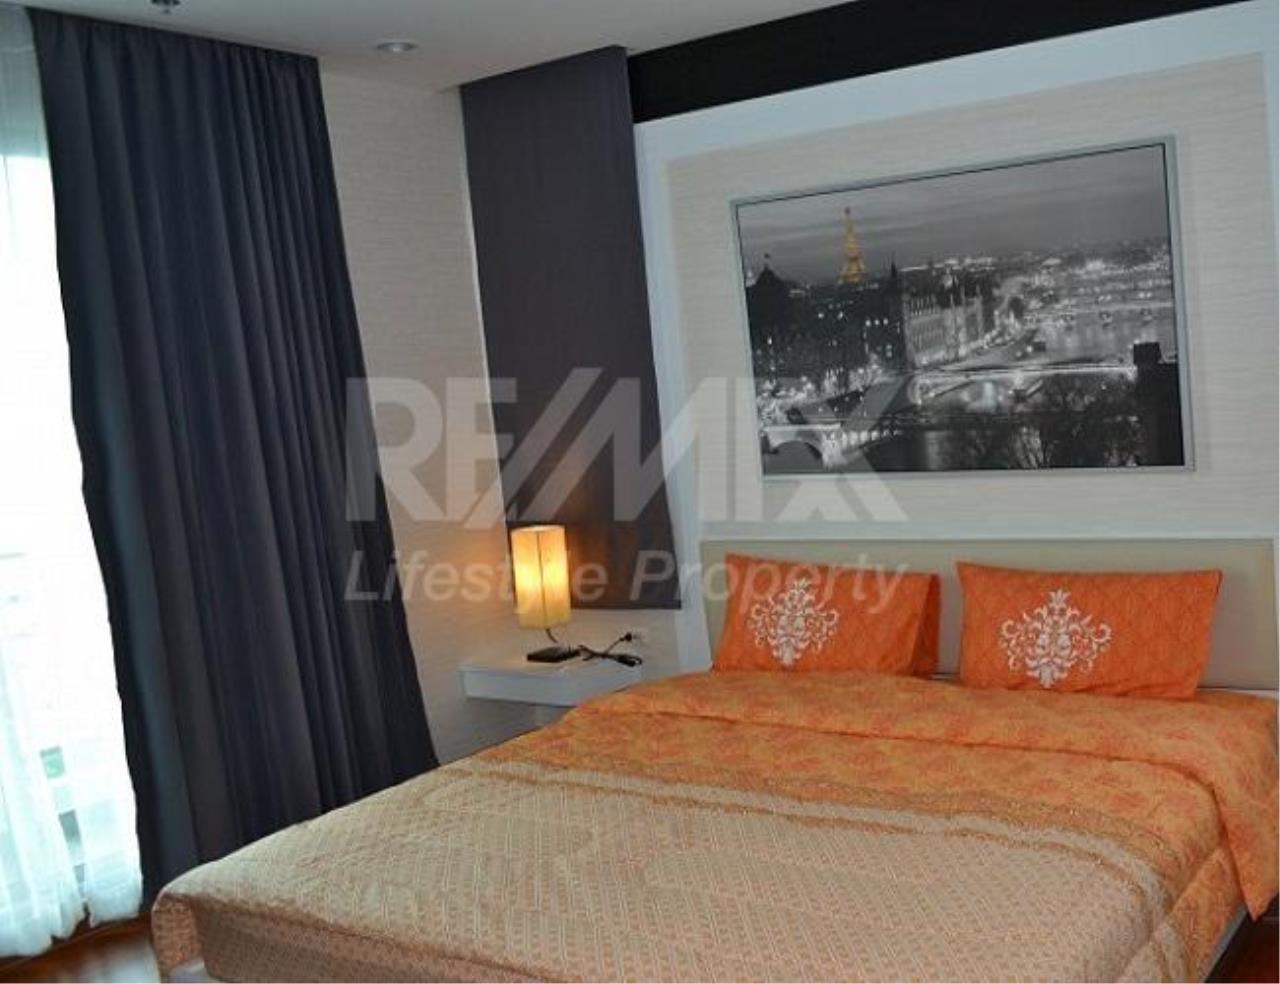 RE/MAX LifeStyle Property Agency's Supalai Lite Sathorn - Charoenrat 4